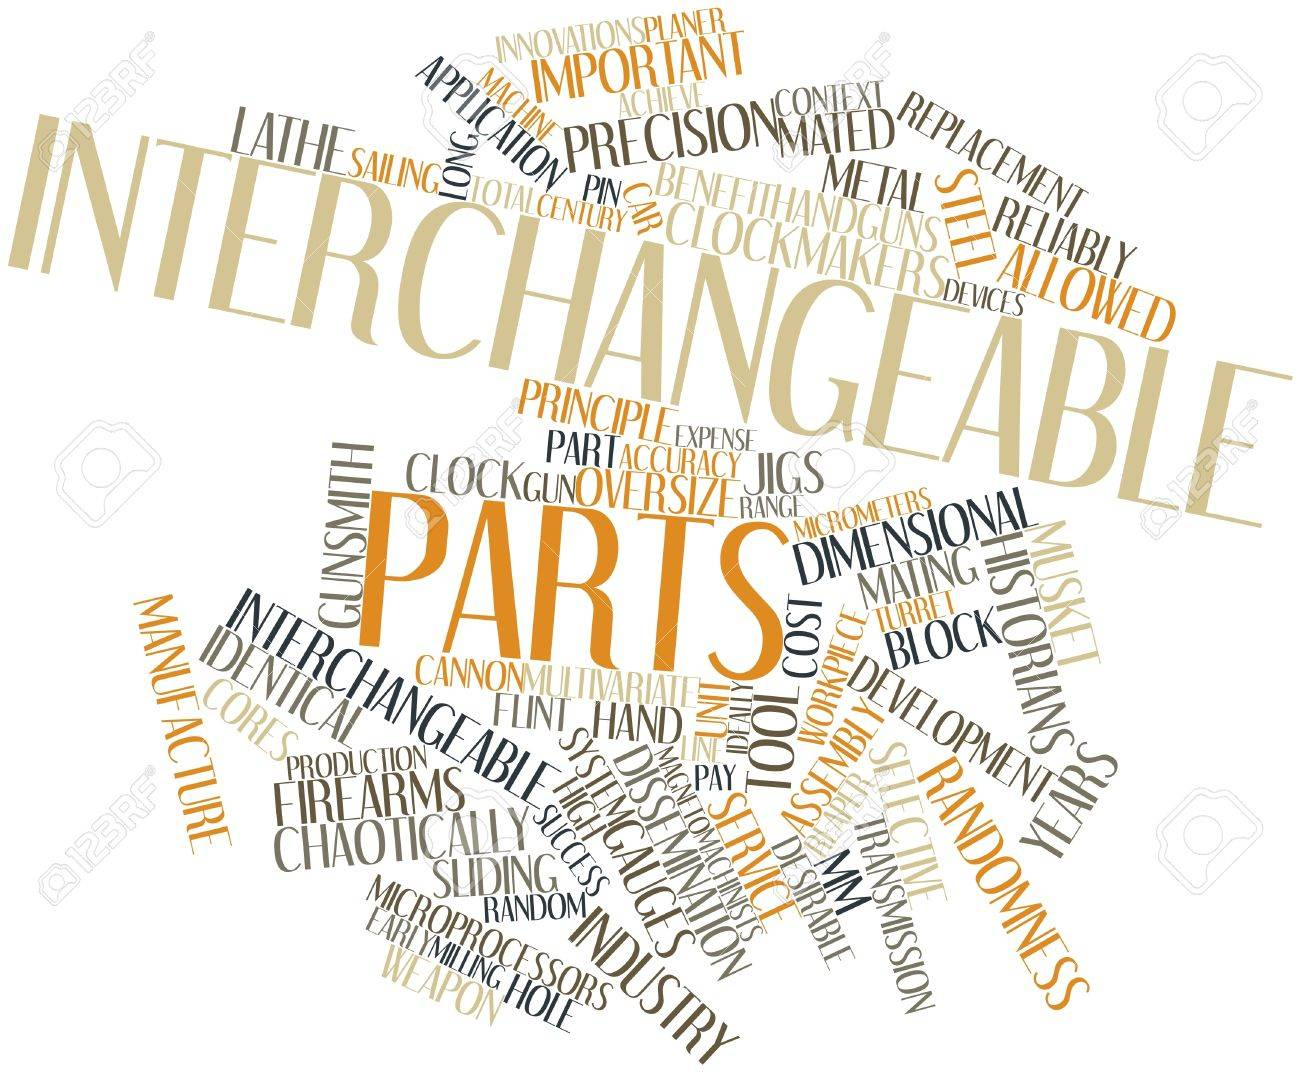 Abstract parts